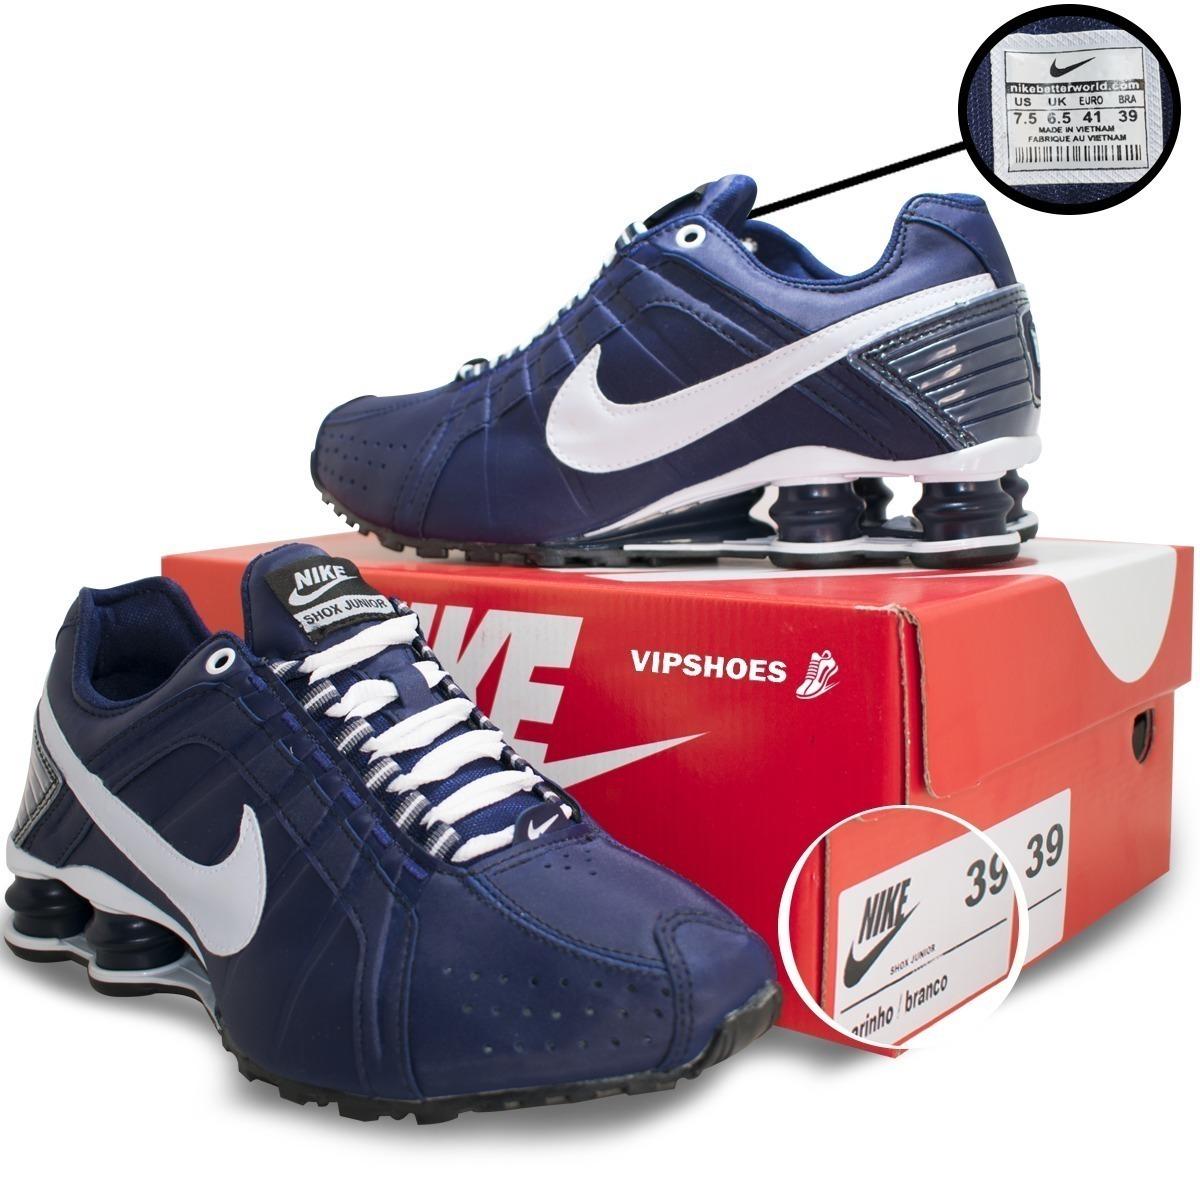 original nike shox uk Shop our wide selection of Nike Air force 1 sale ... 09e67705d3b0